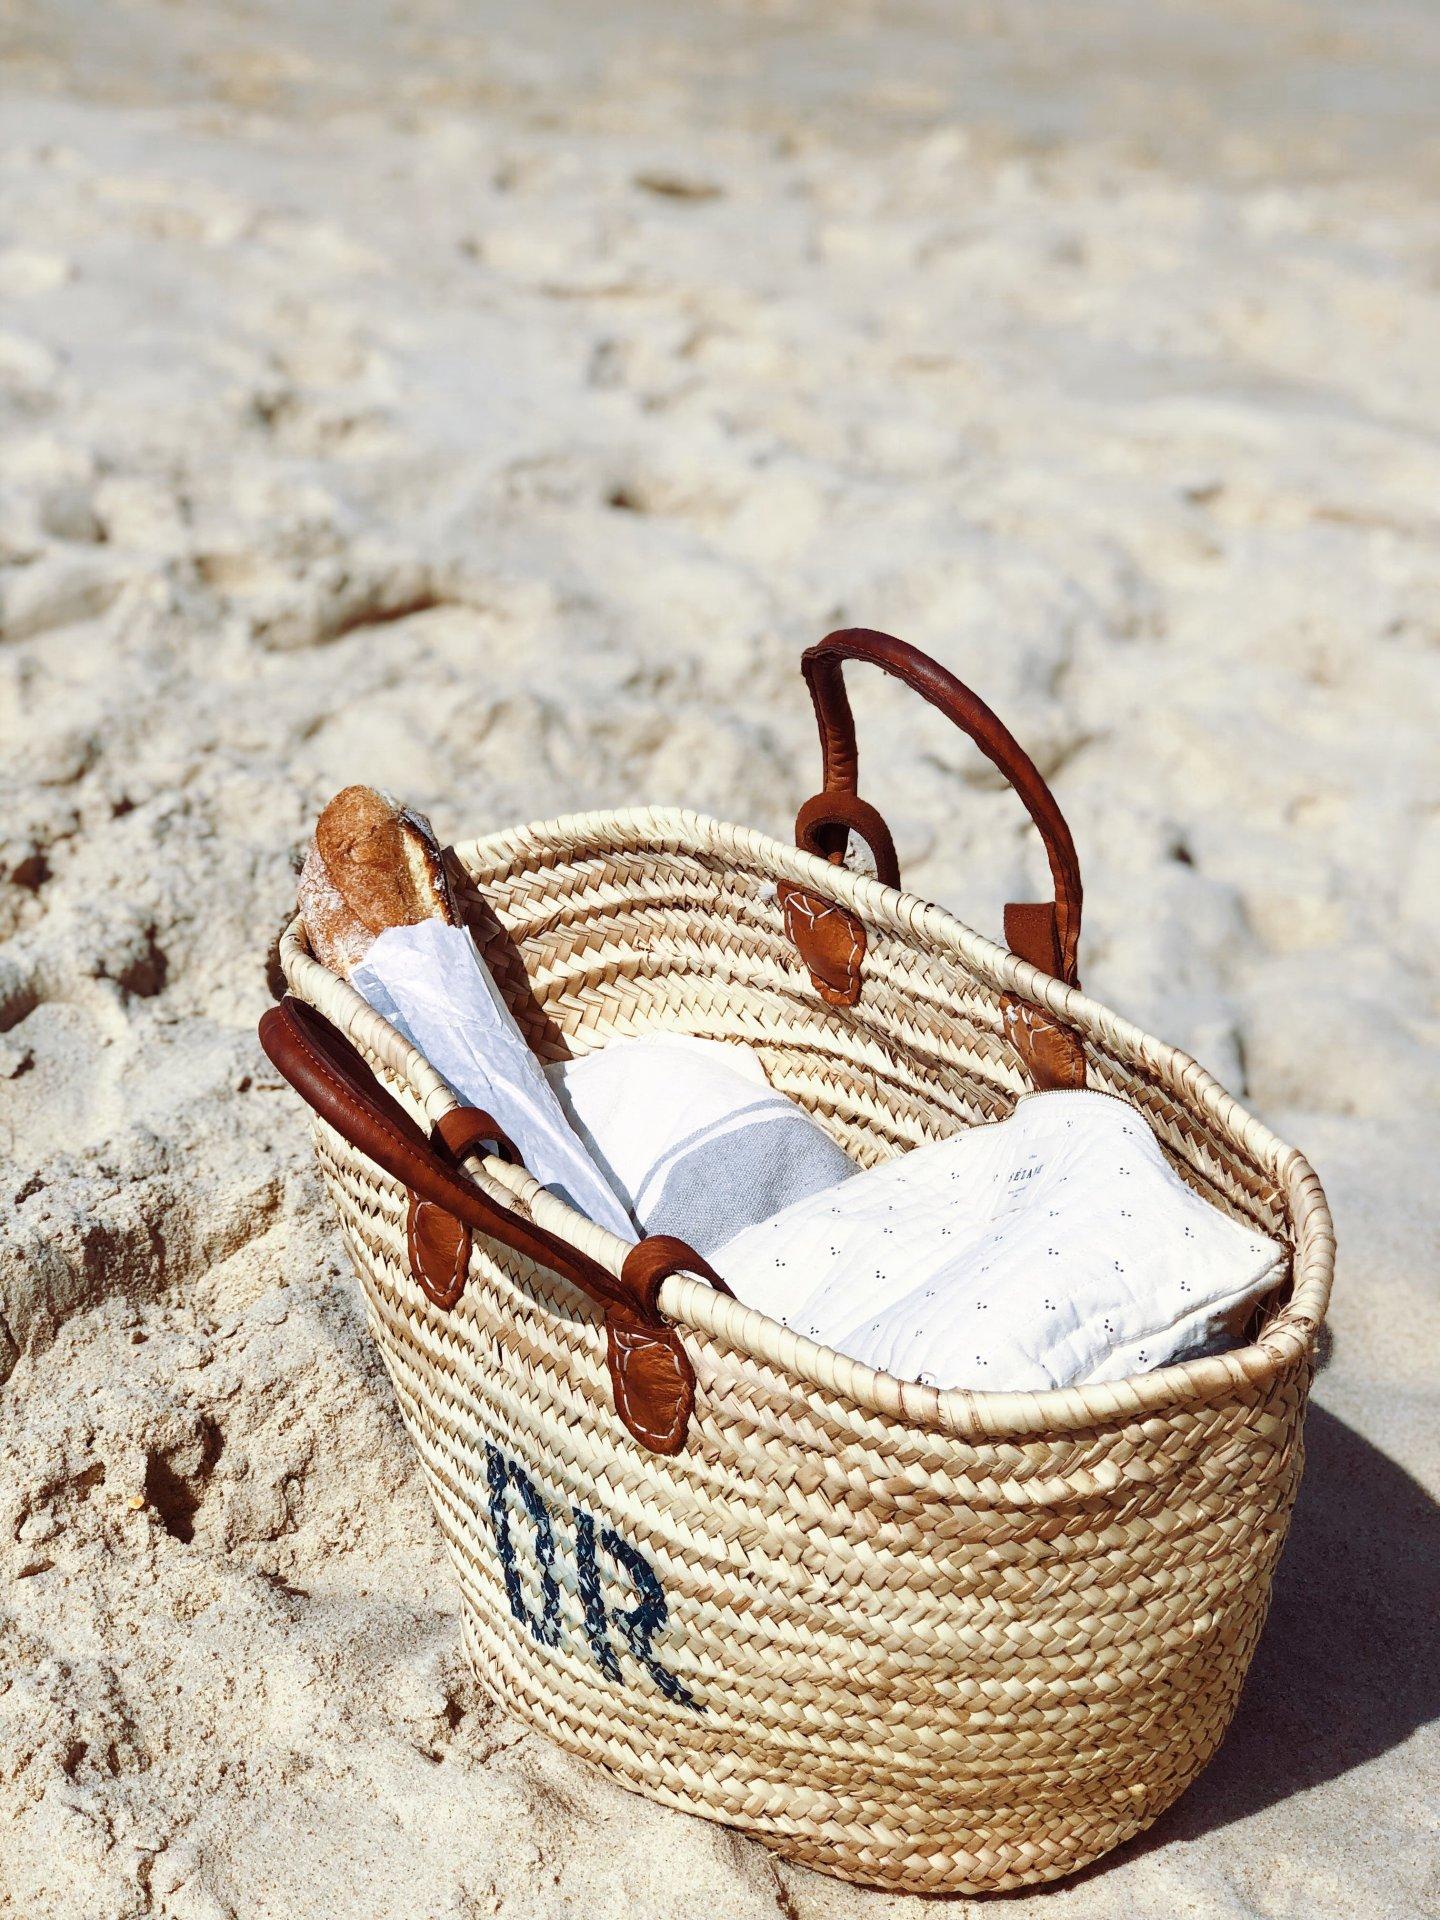 Einfache Meditation, Anleitung, Korb am Strand,